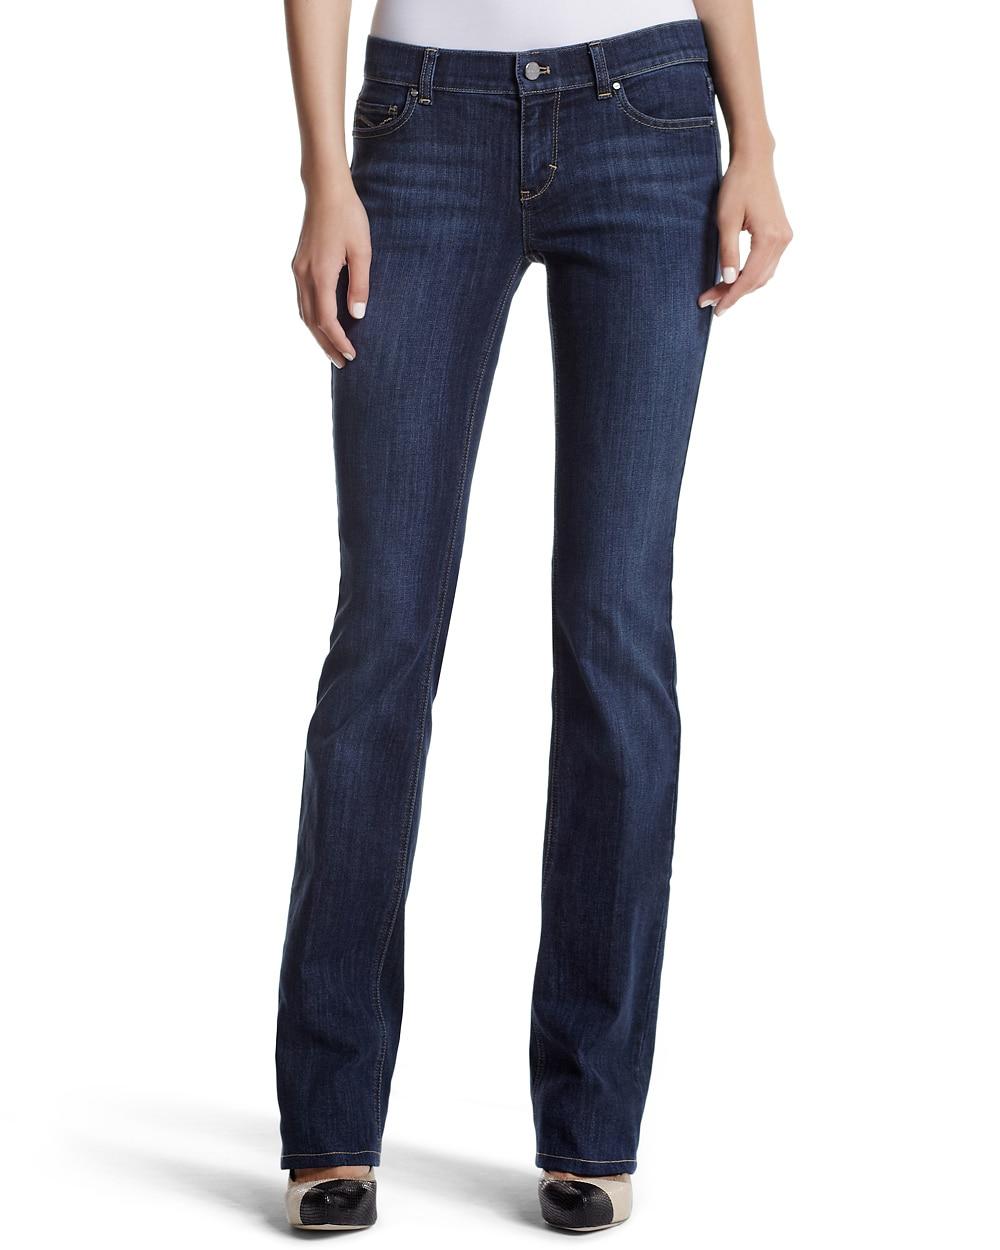 Noir jeans white house black market